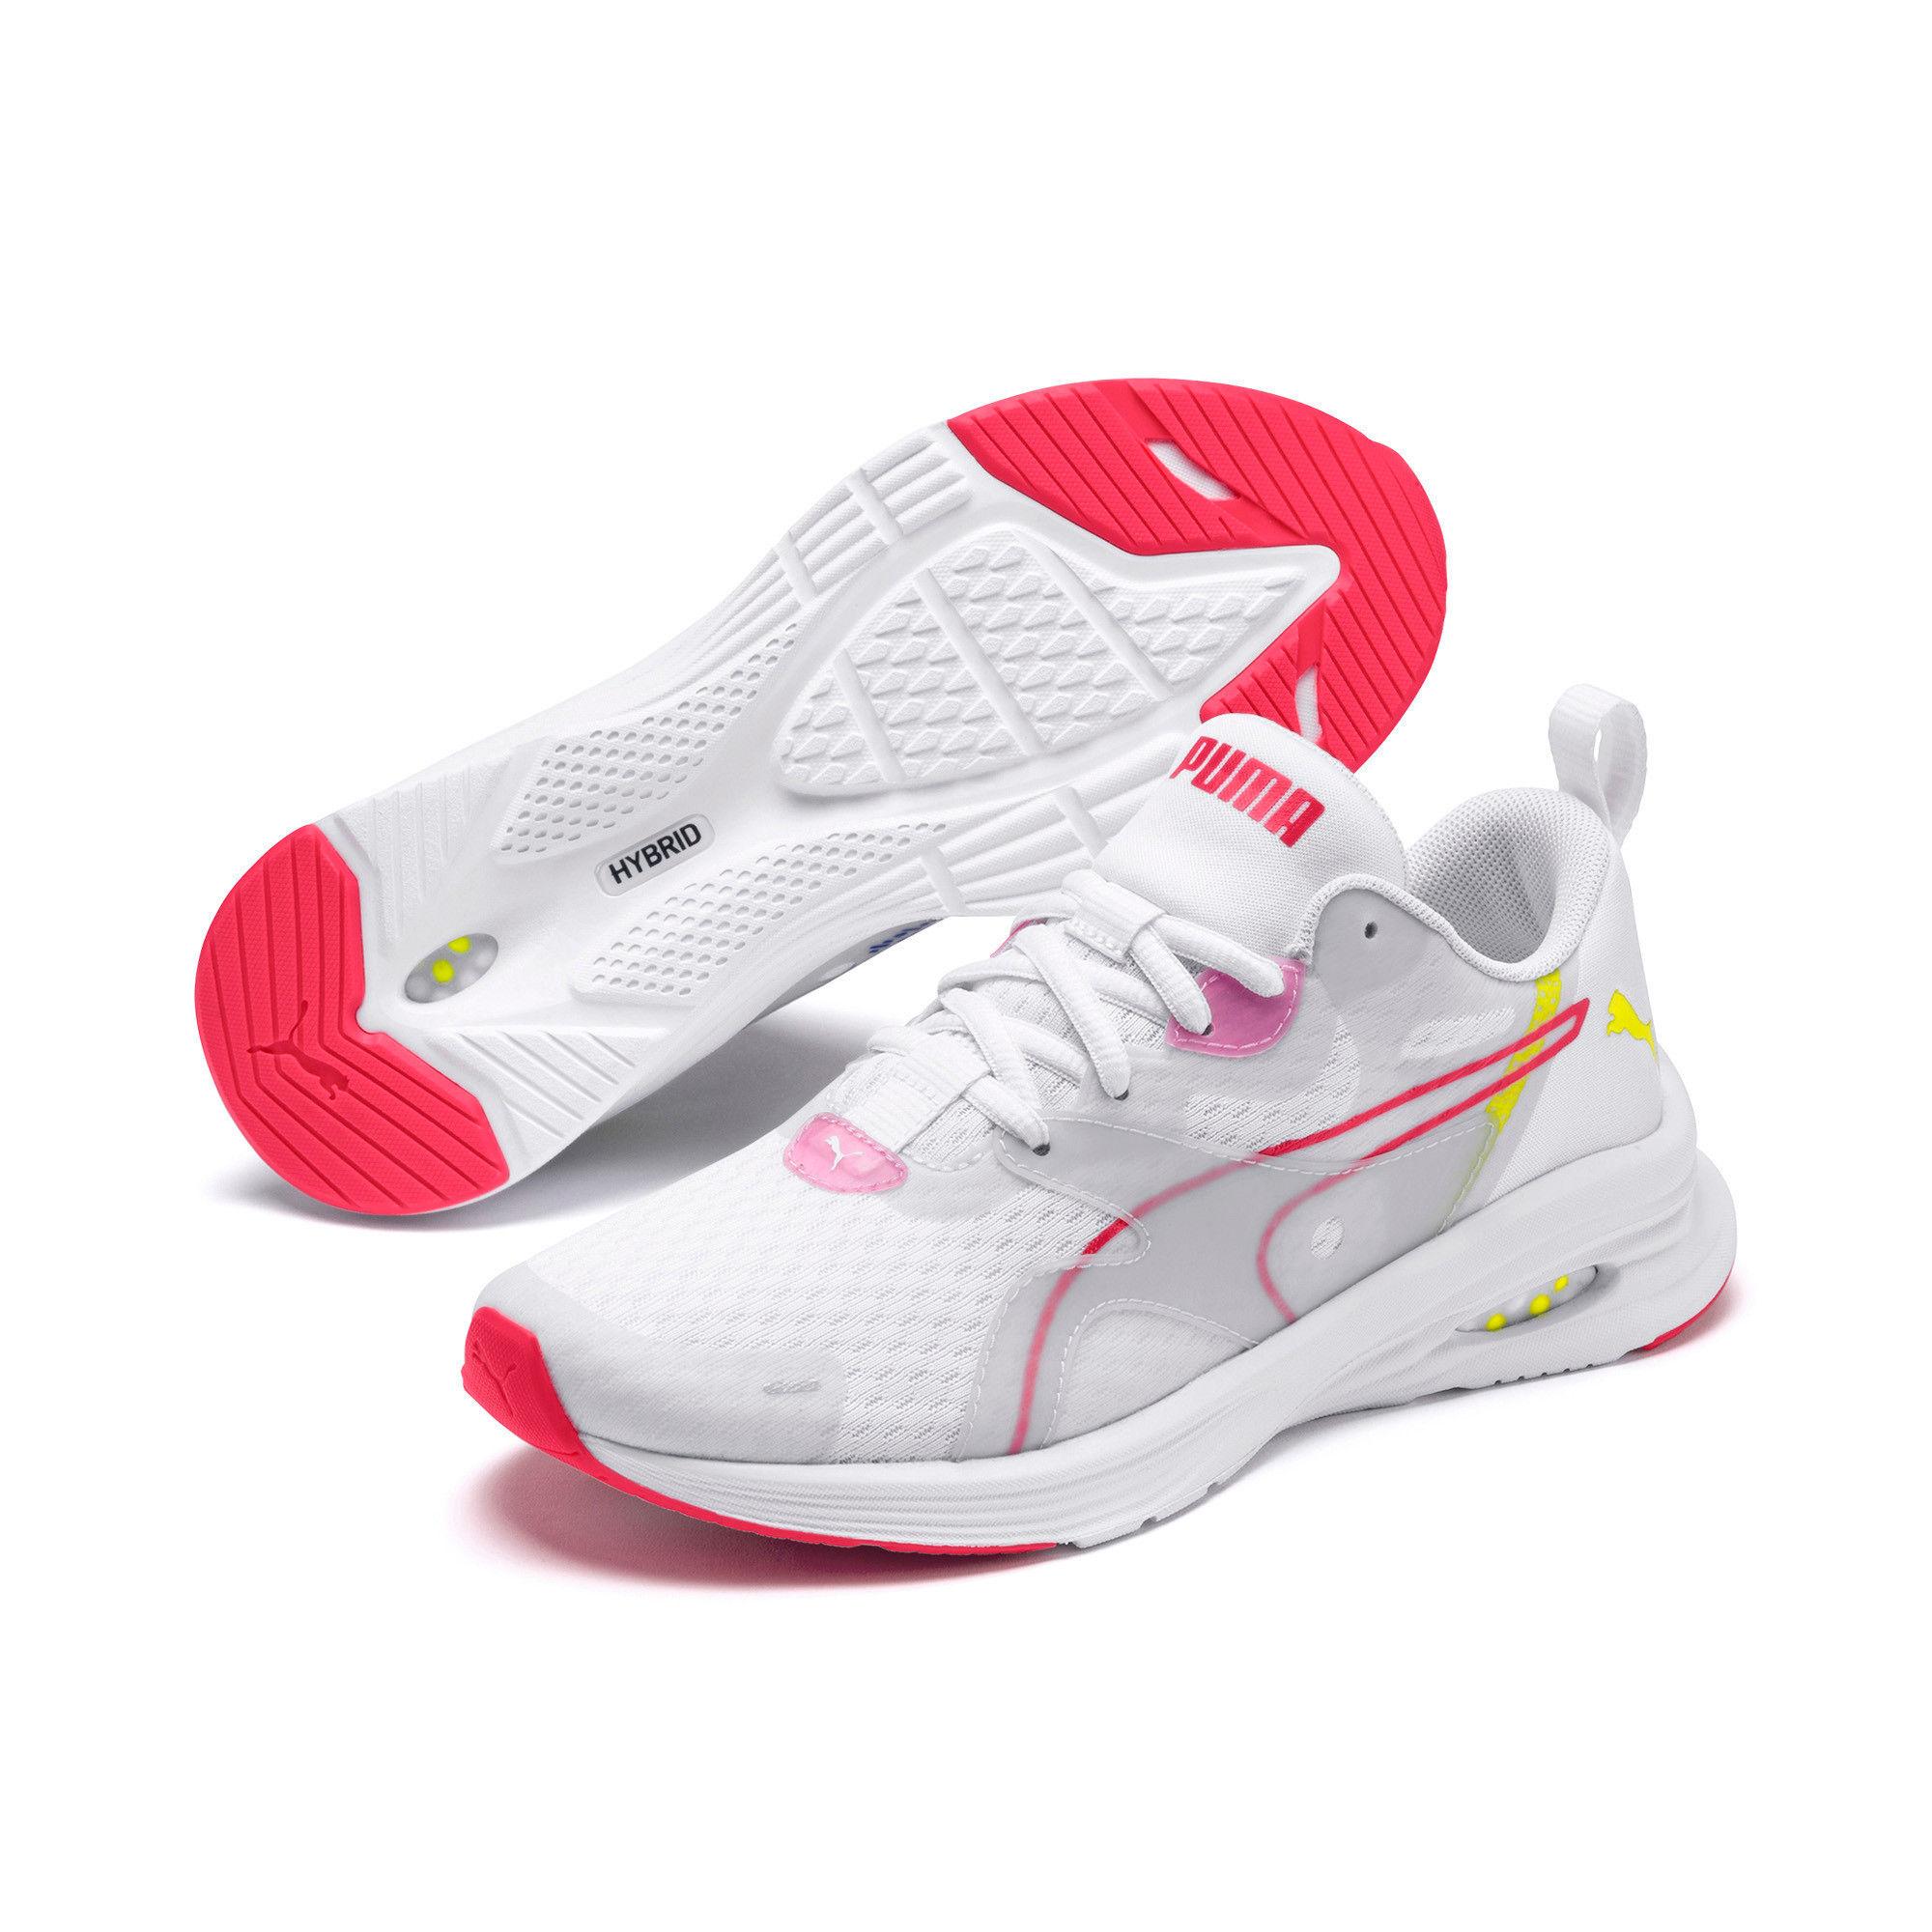 Puma Hybrid Fuego Women's Shoes - White